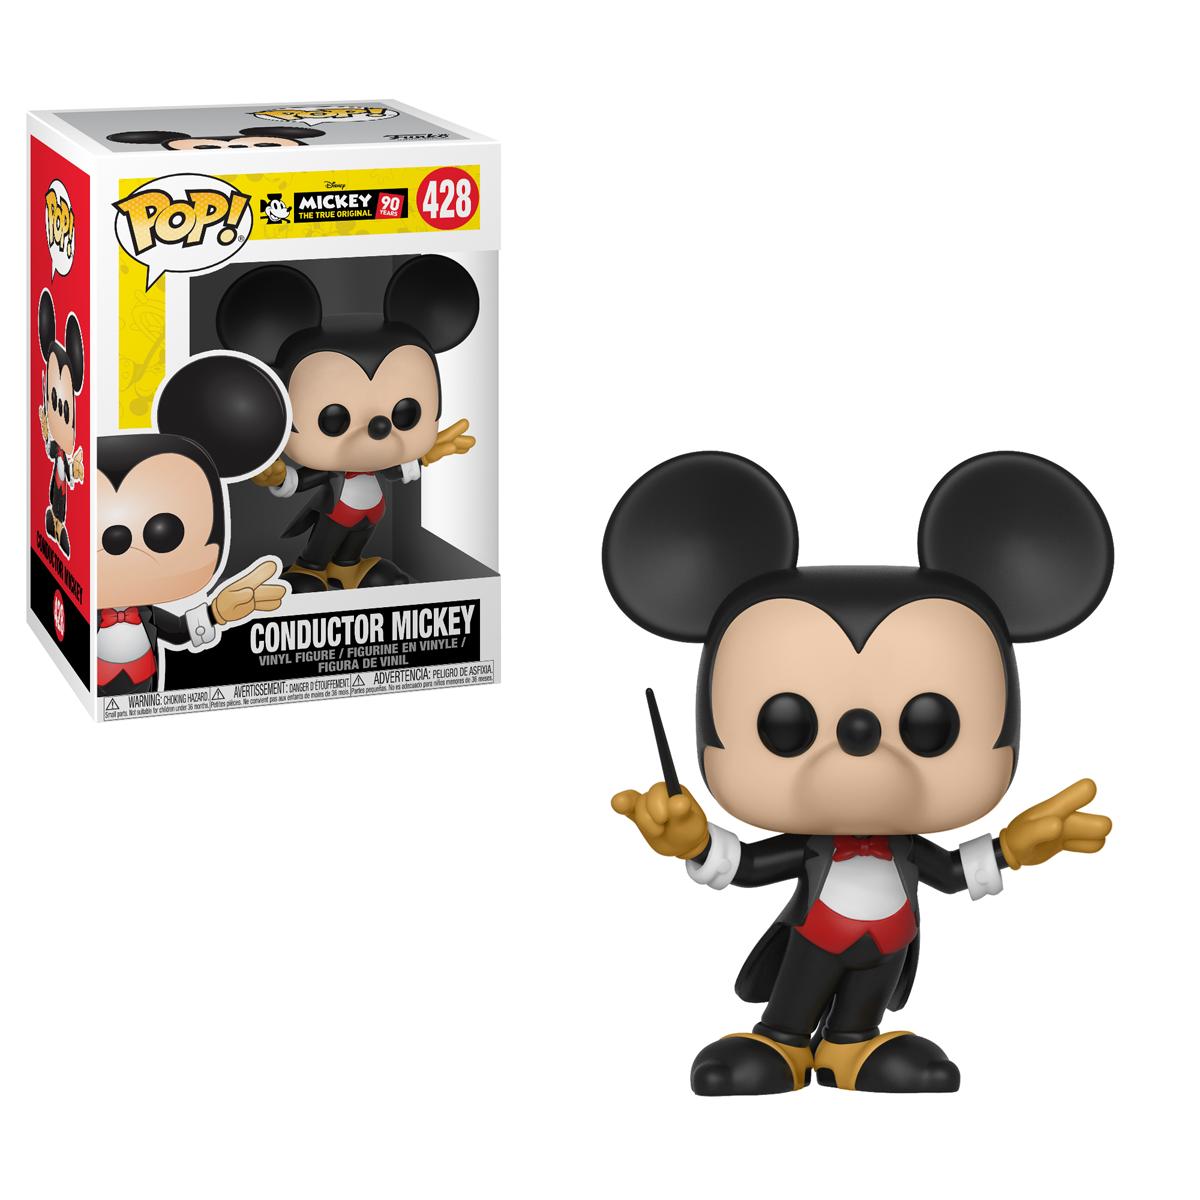 Disney: Plane Crazy Mickey Funko Pop 2019, Toy NUEVO Mickey/'s 90th